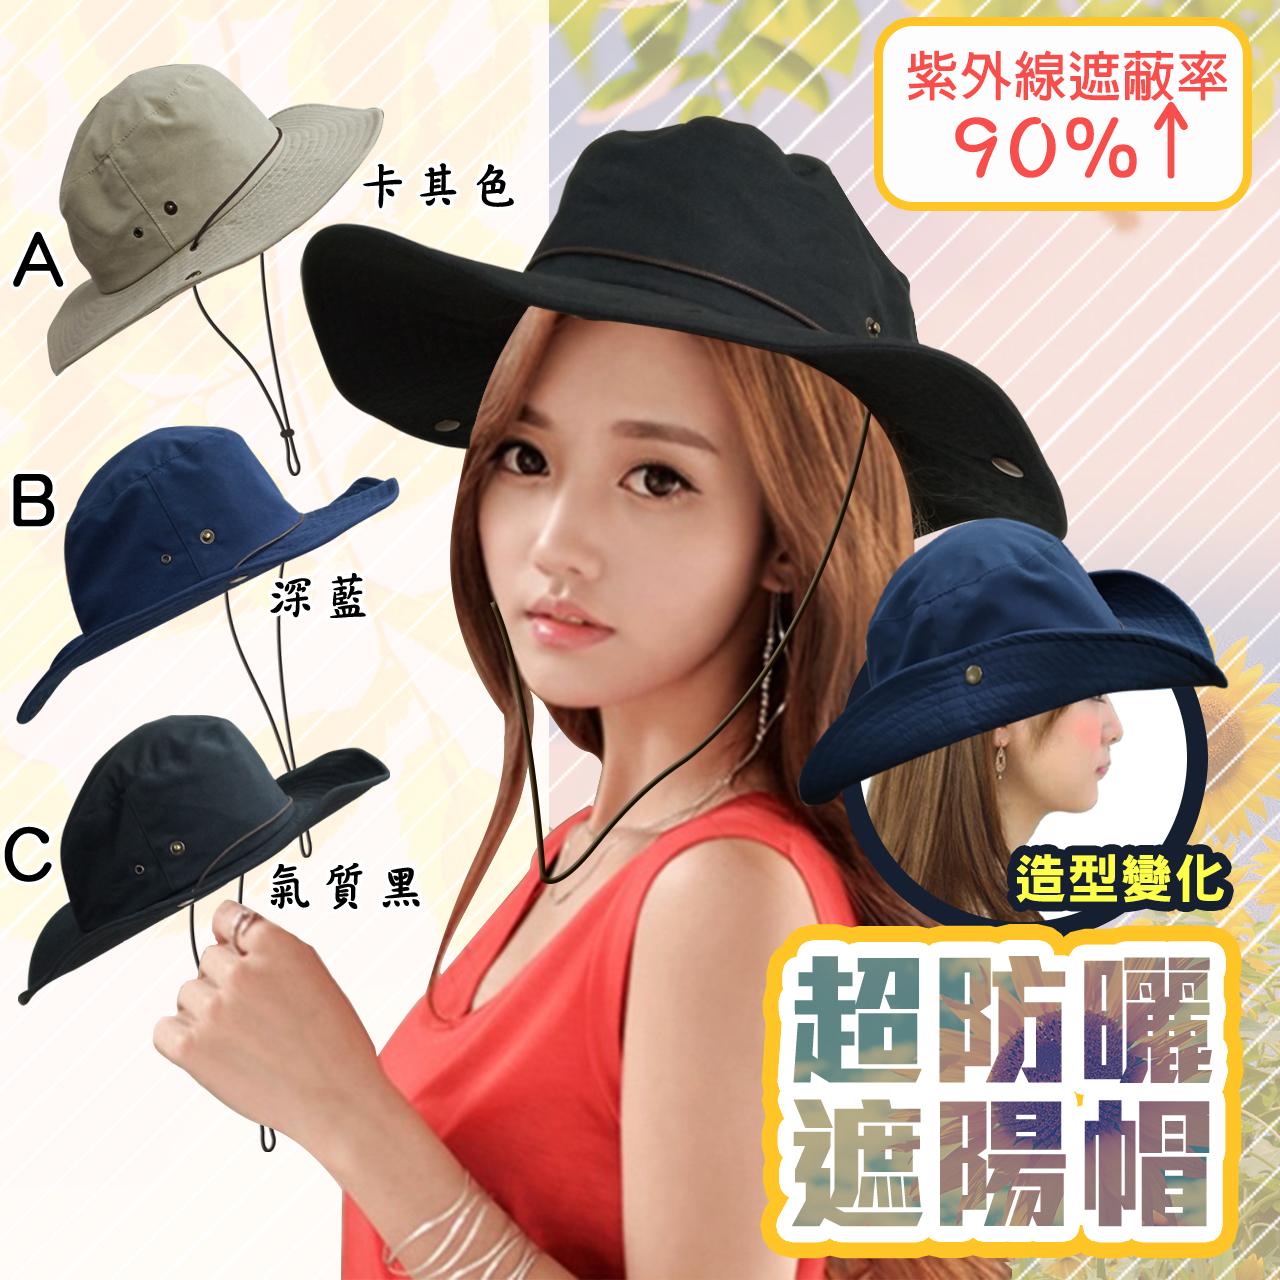 《HOYA-Life日本生活館》 防曬 抗UV 遮陽帽 漁夫帽